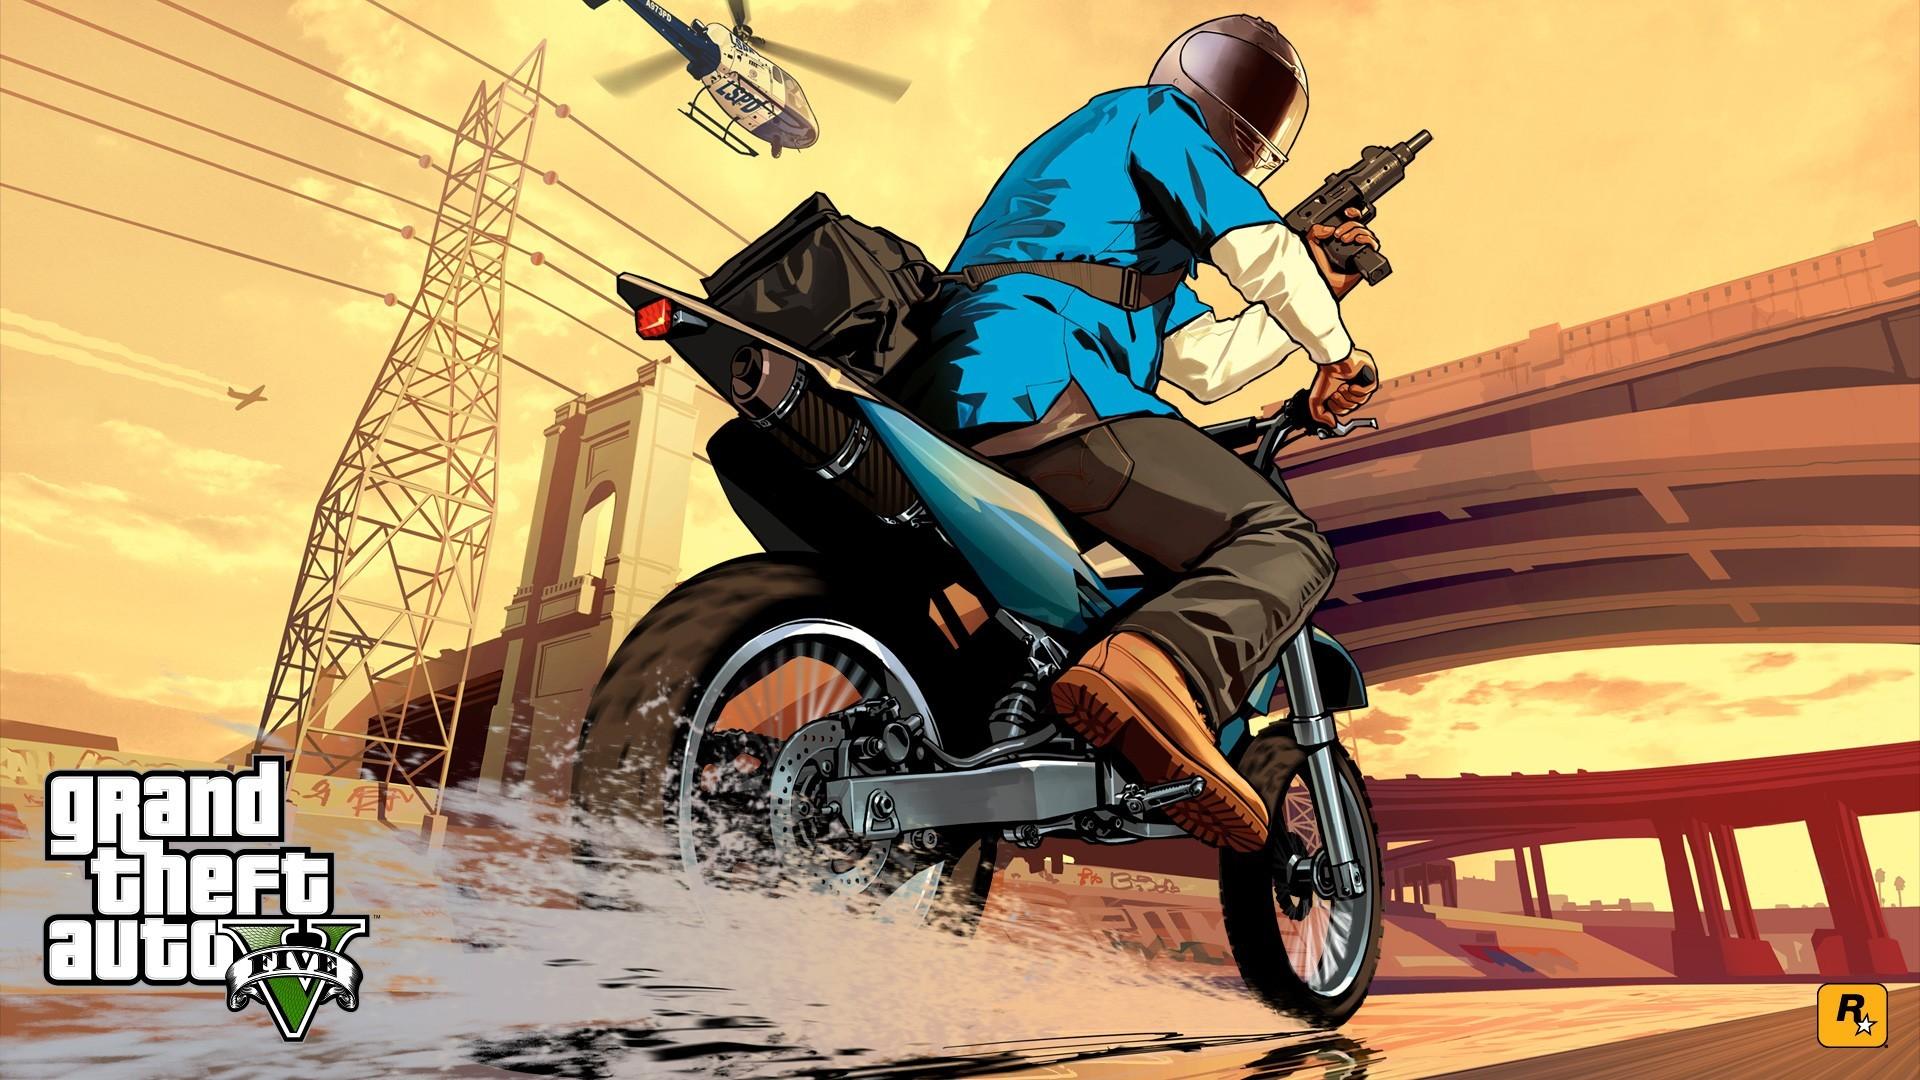 Wallpaper grand theft auto v, gta, rockstar games, motorcycle